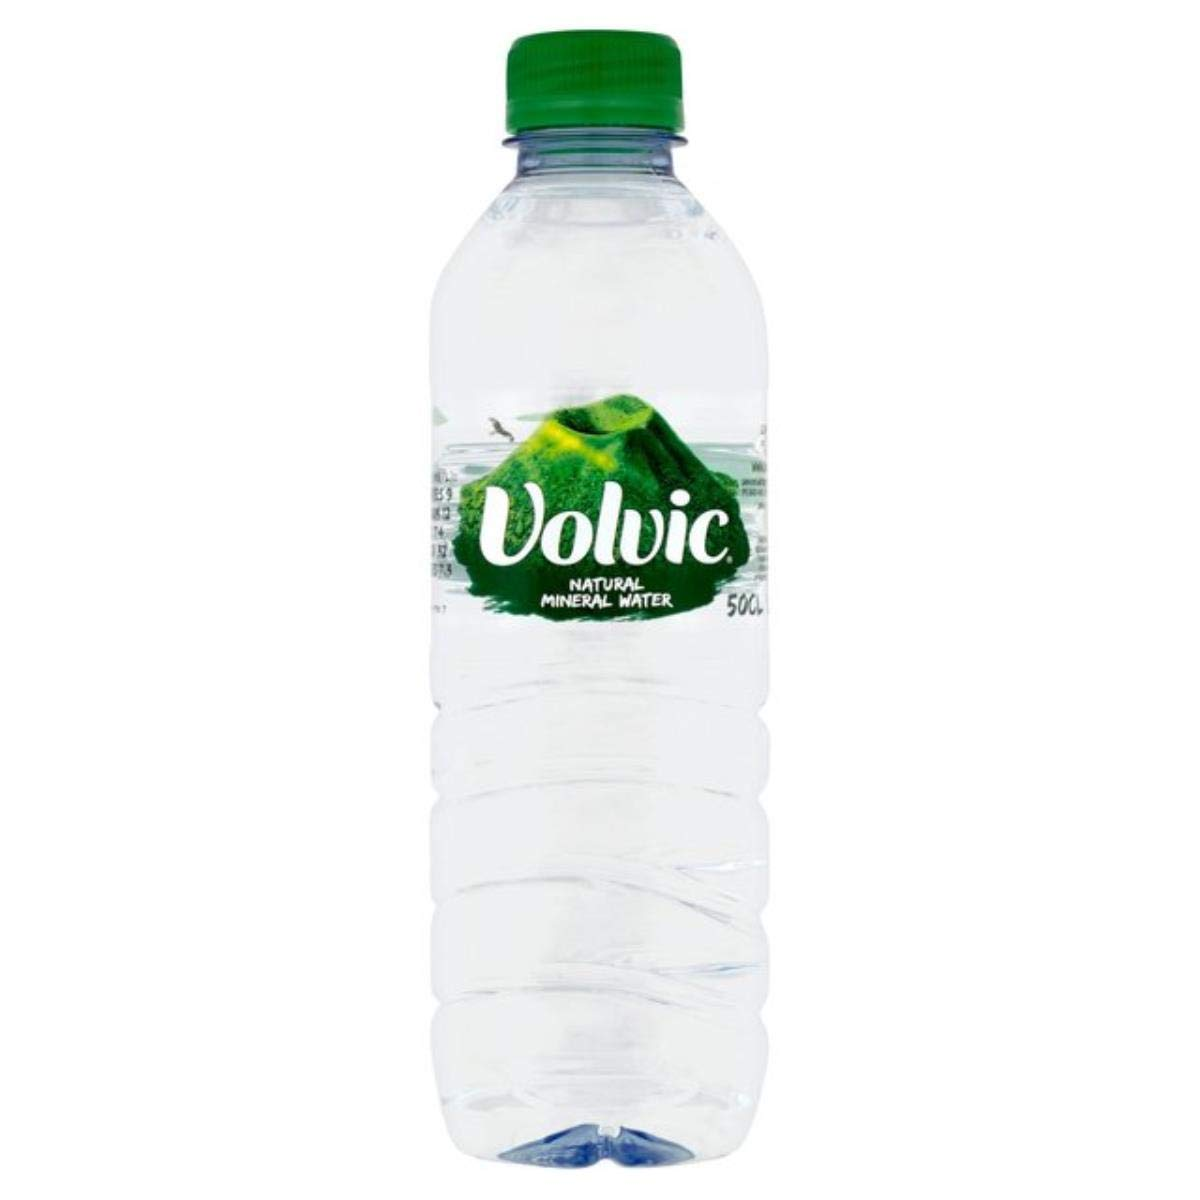 Volvic - 500ml -6 Pack